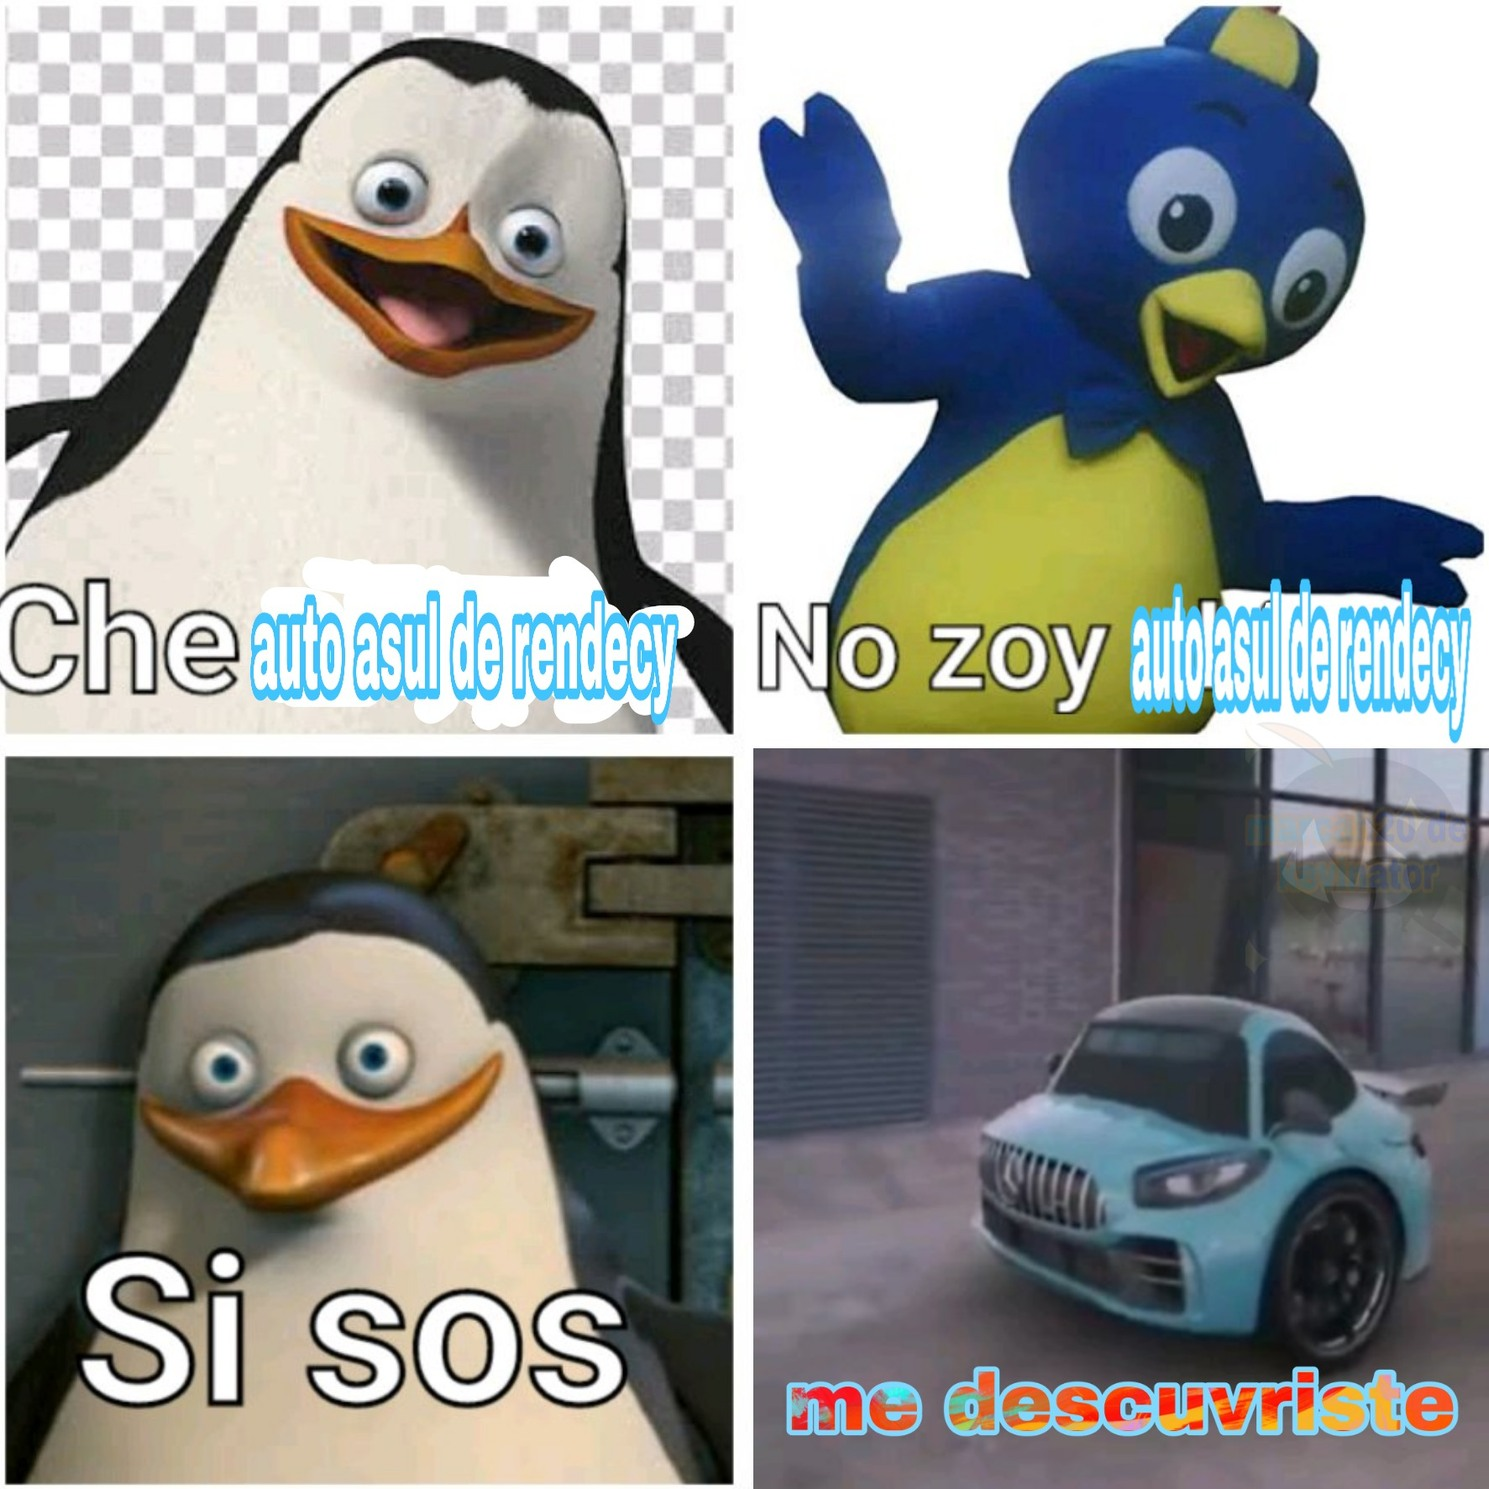 El auto rendecy - meme